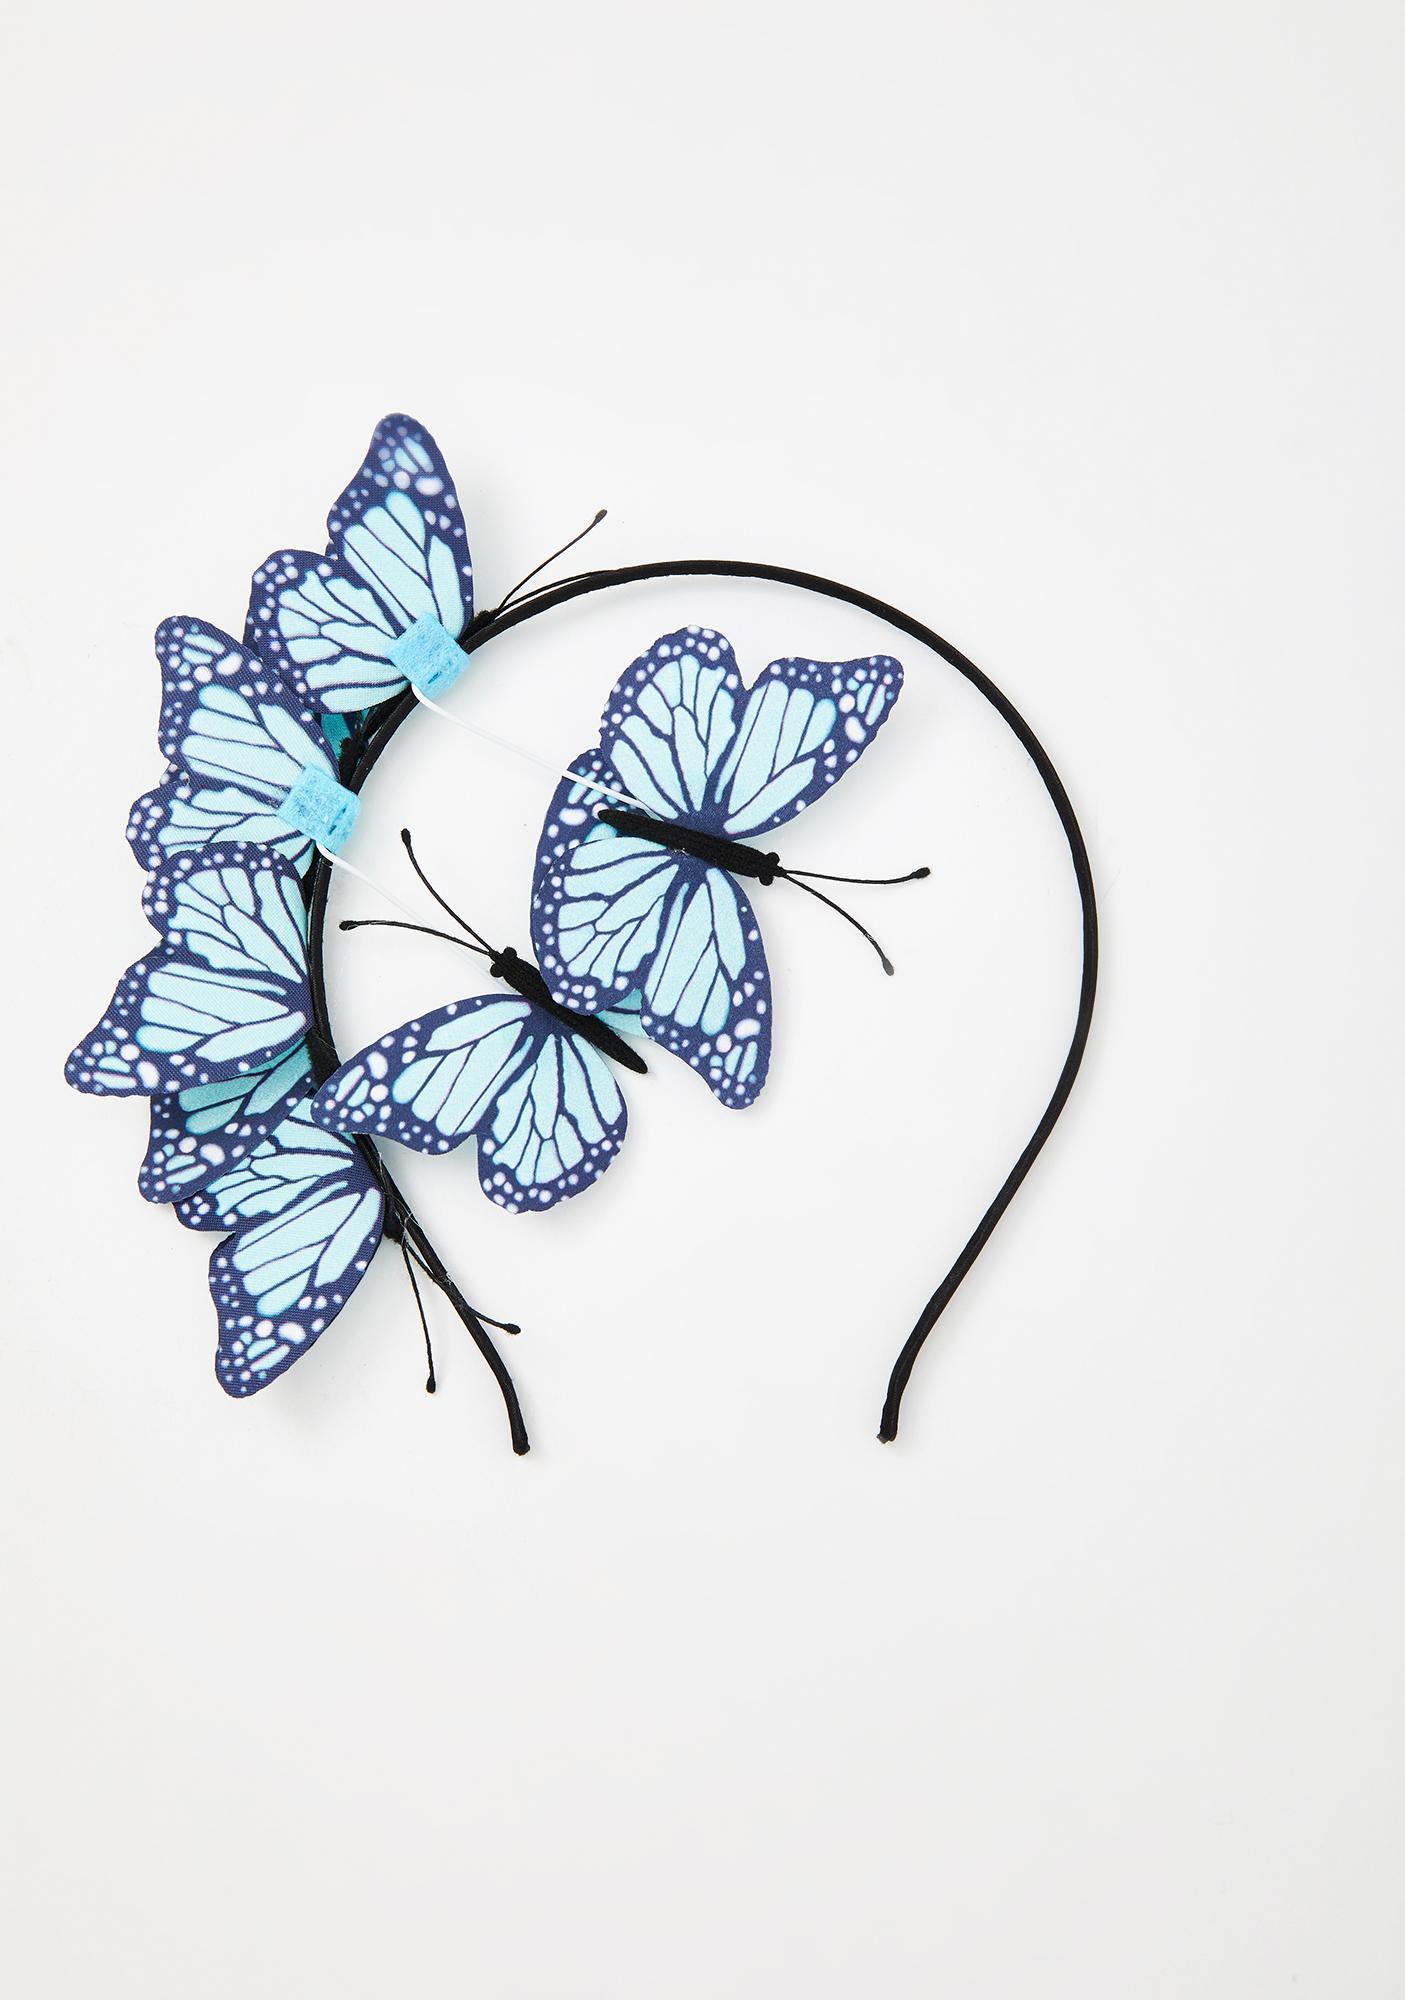 Fly Too High Butterfly Headband